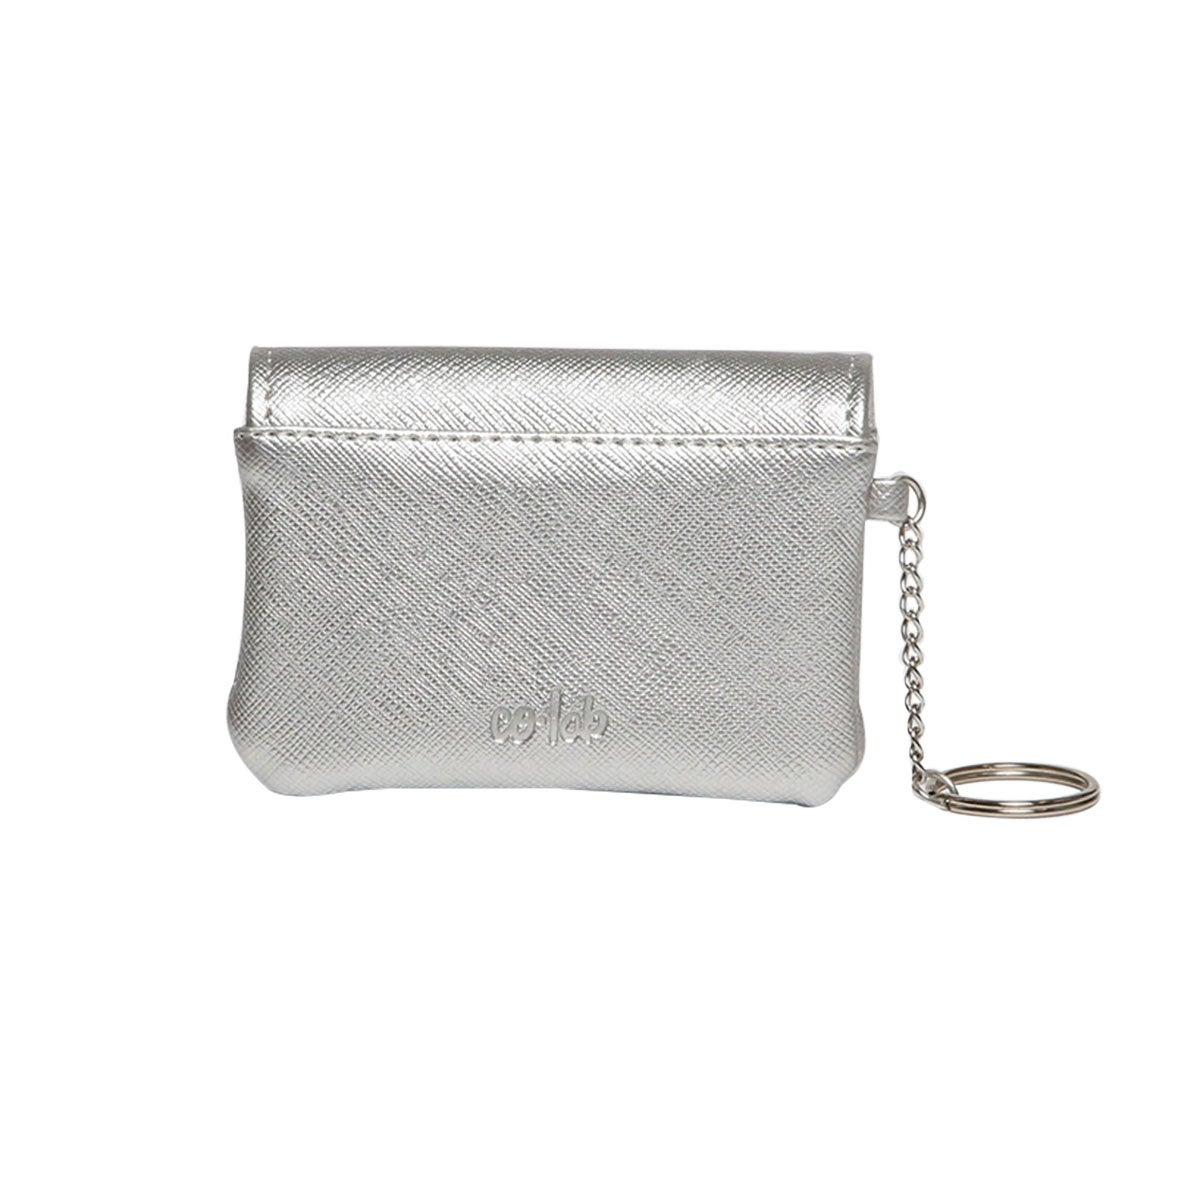 Lds silver mini coin purse